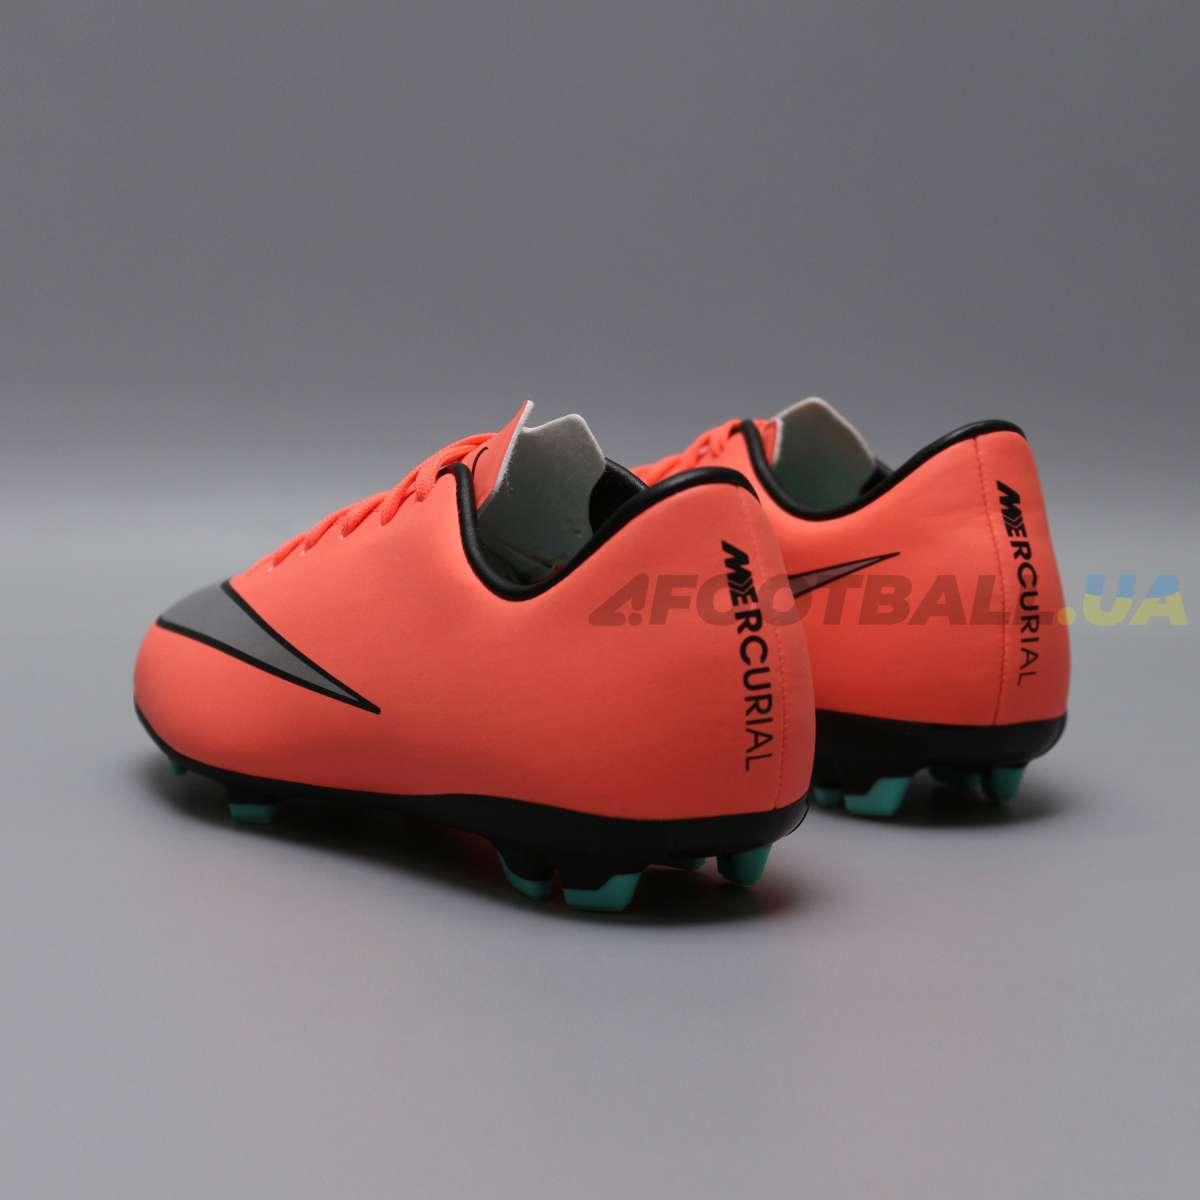 Детские бутсы Nike Mercurial Victory V FG - Mango — купить в ... 297e959e57d0a